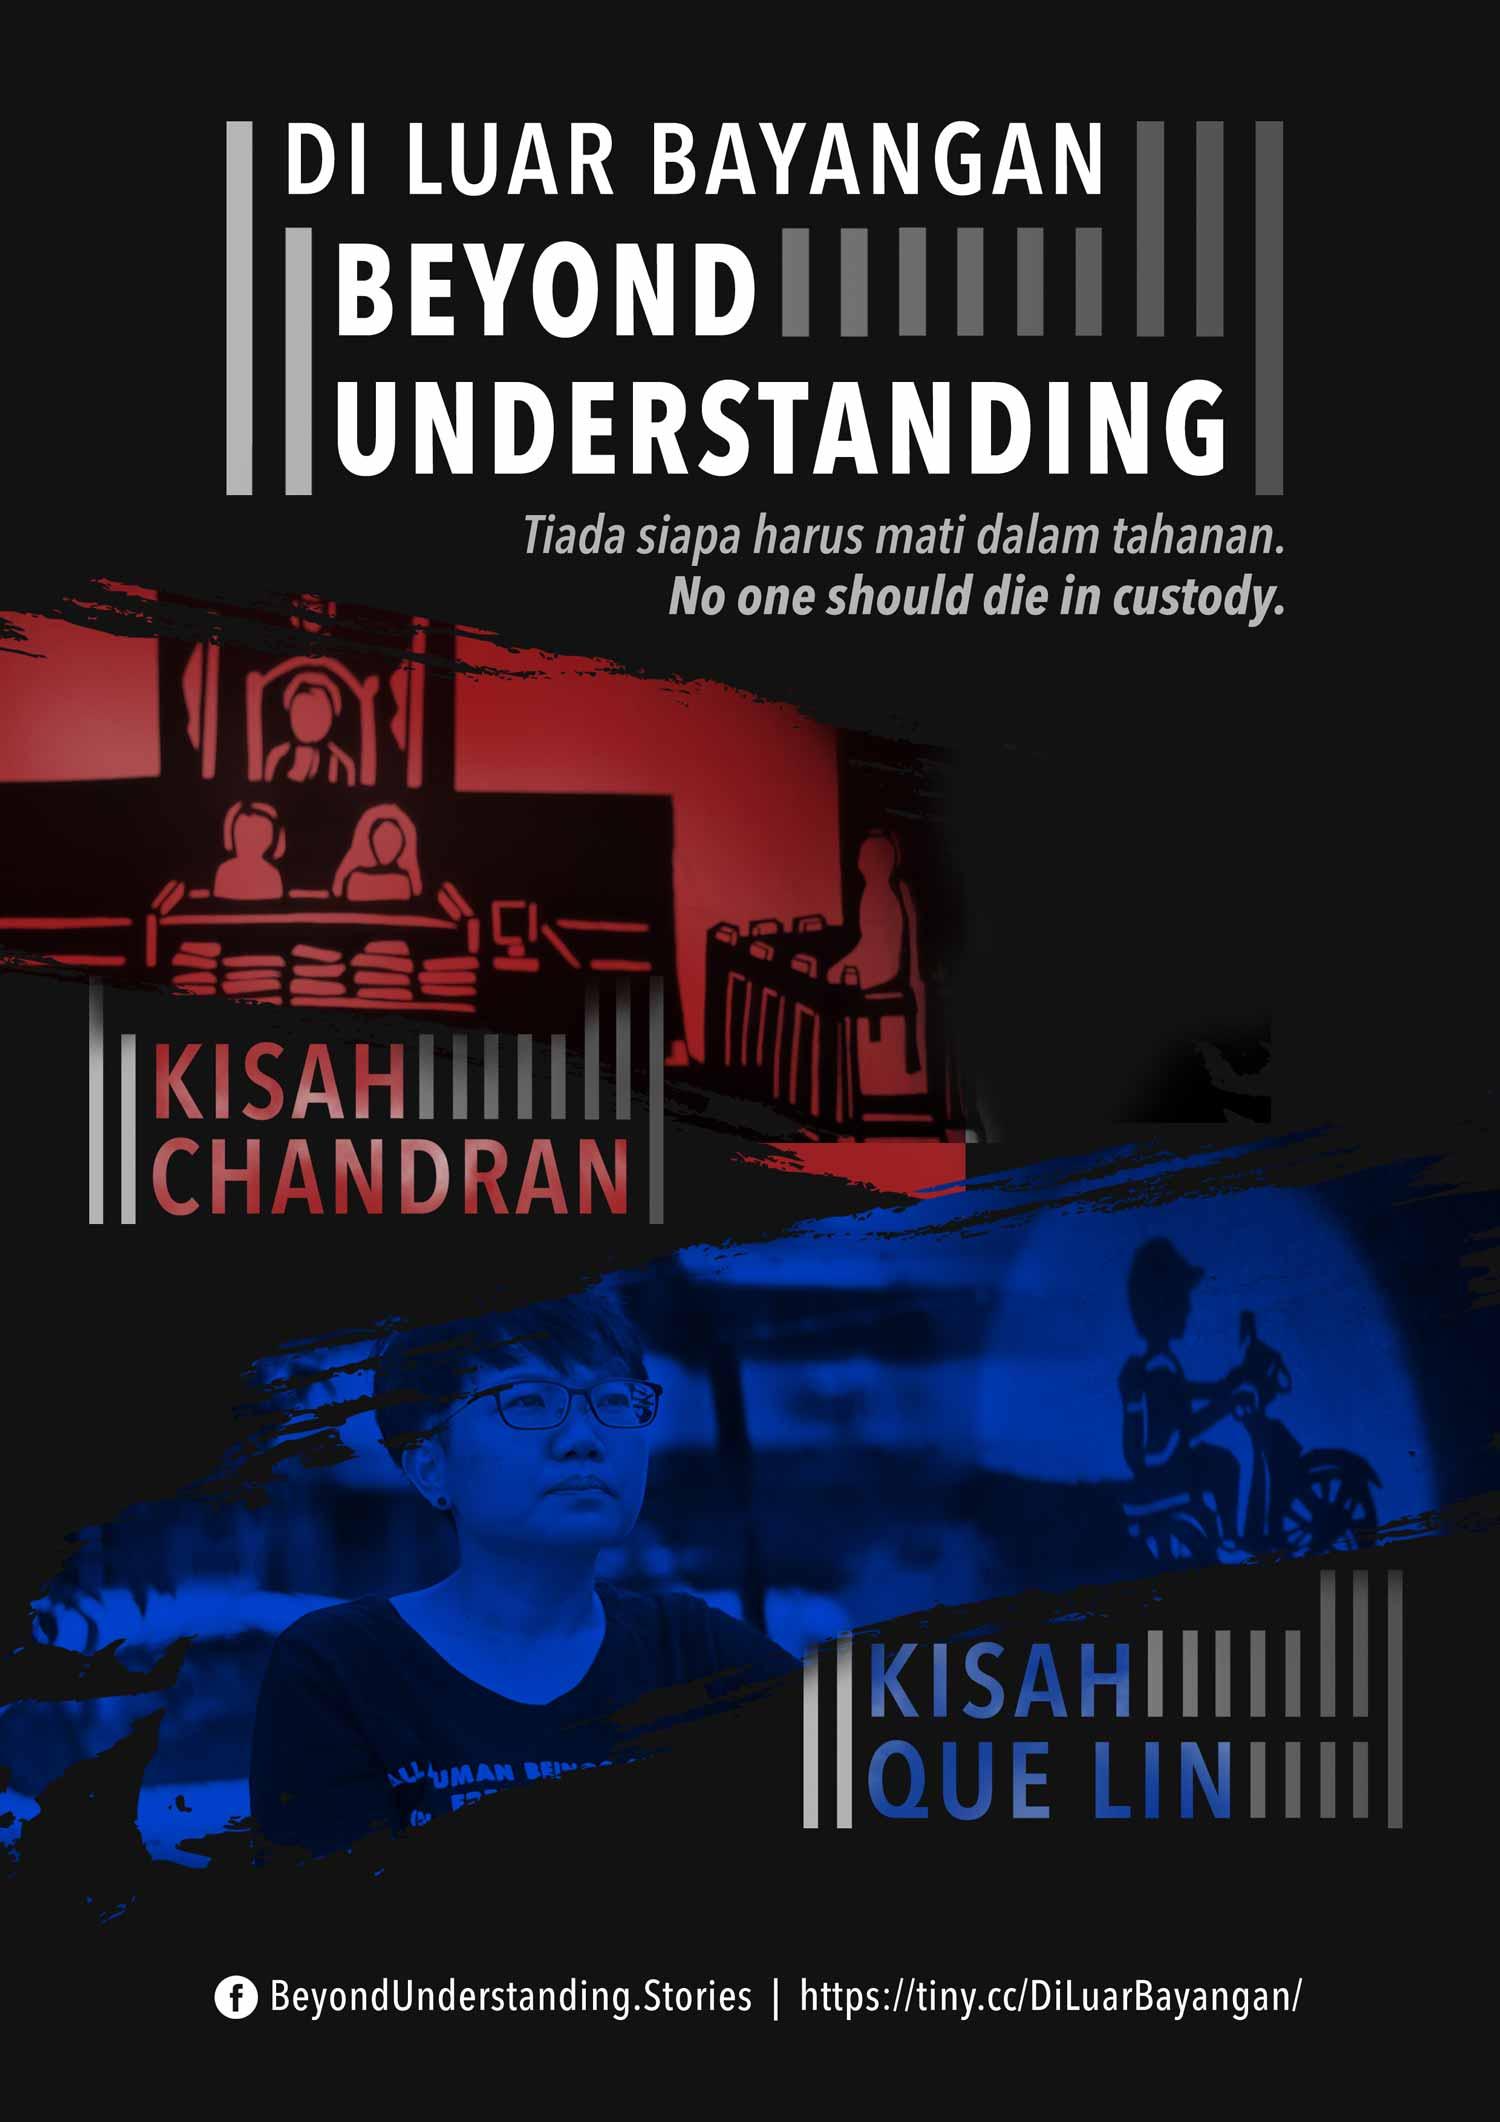 Di Luar Bayangan: Kisah Chandran & Kisah Que Lin (FreedomFilmFest 2020)